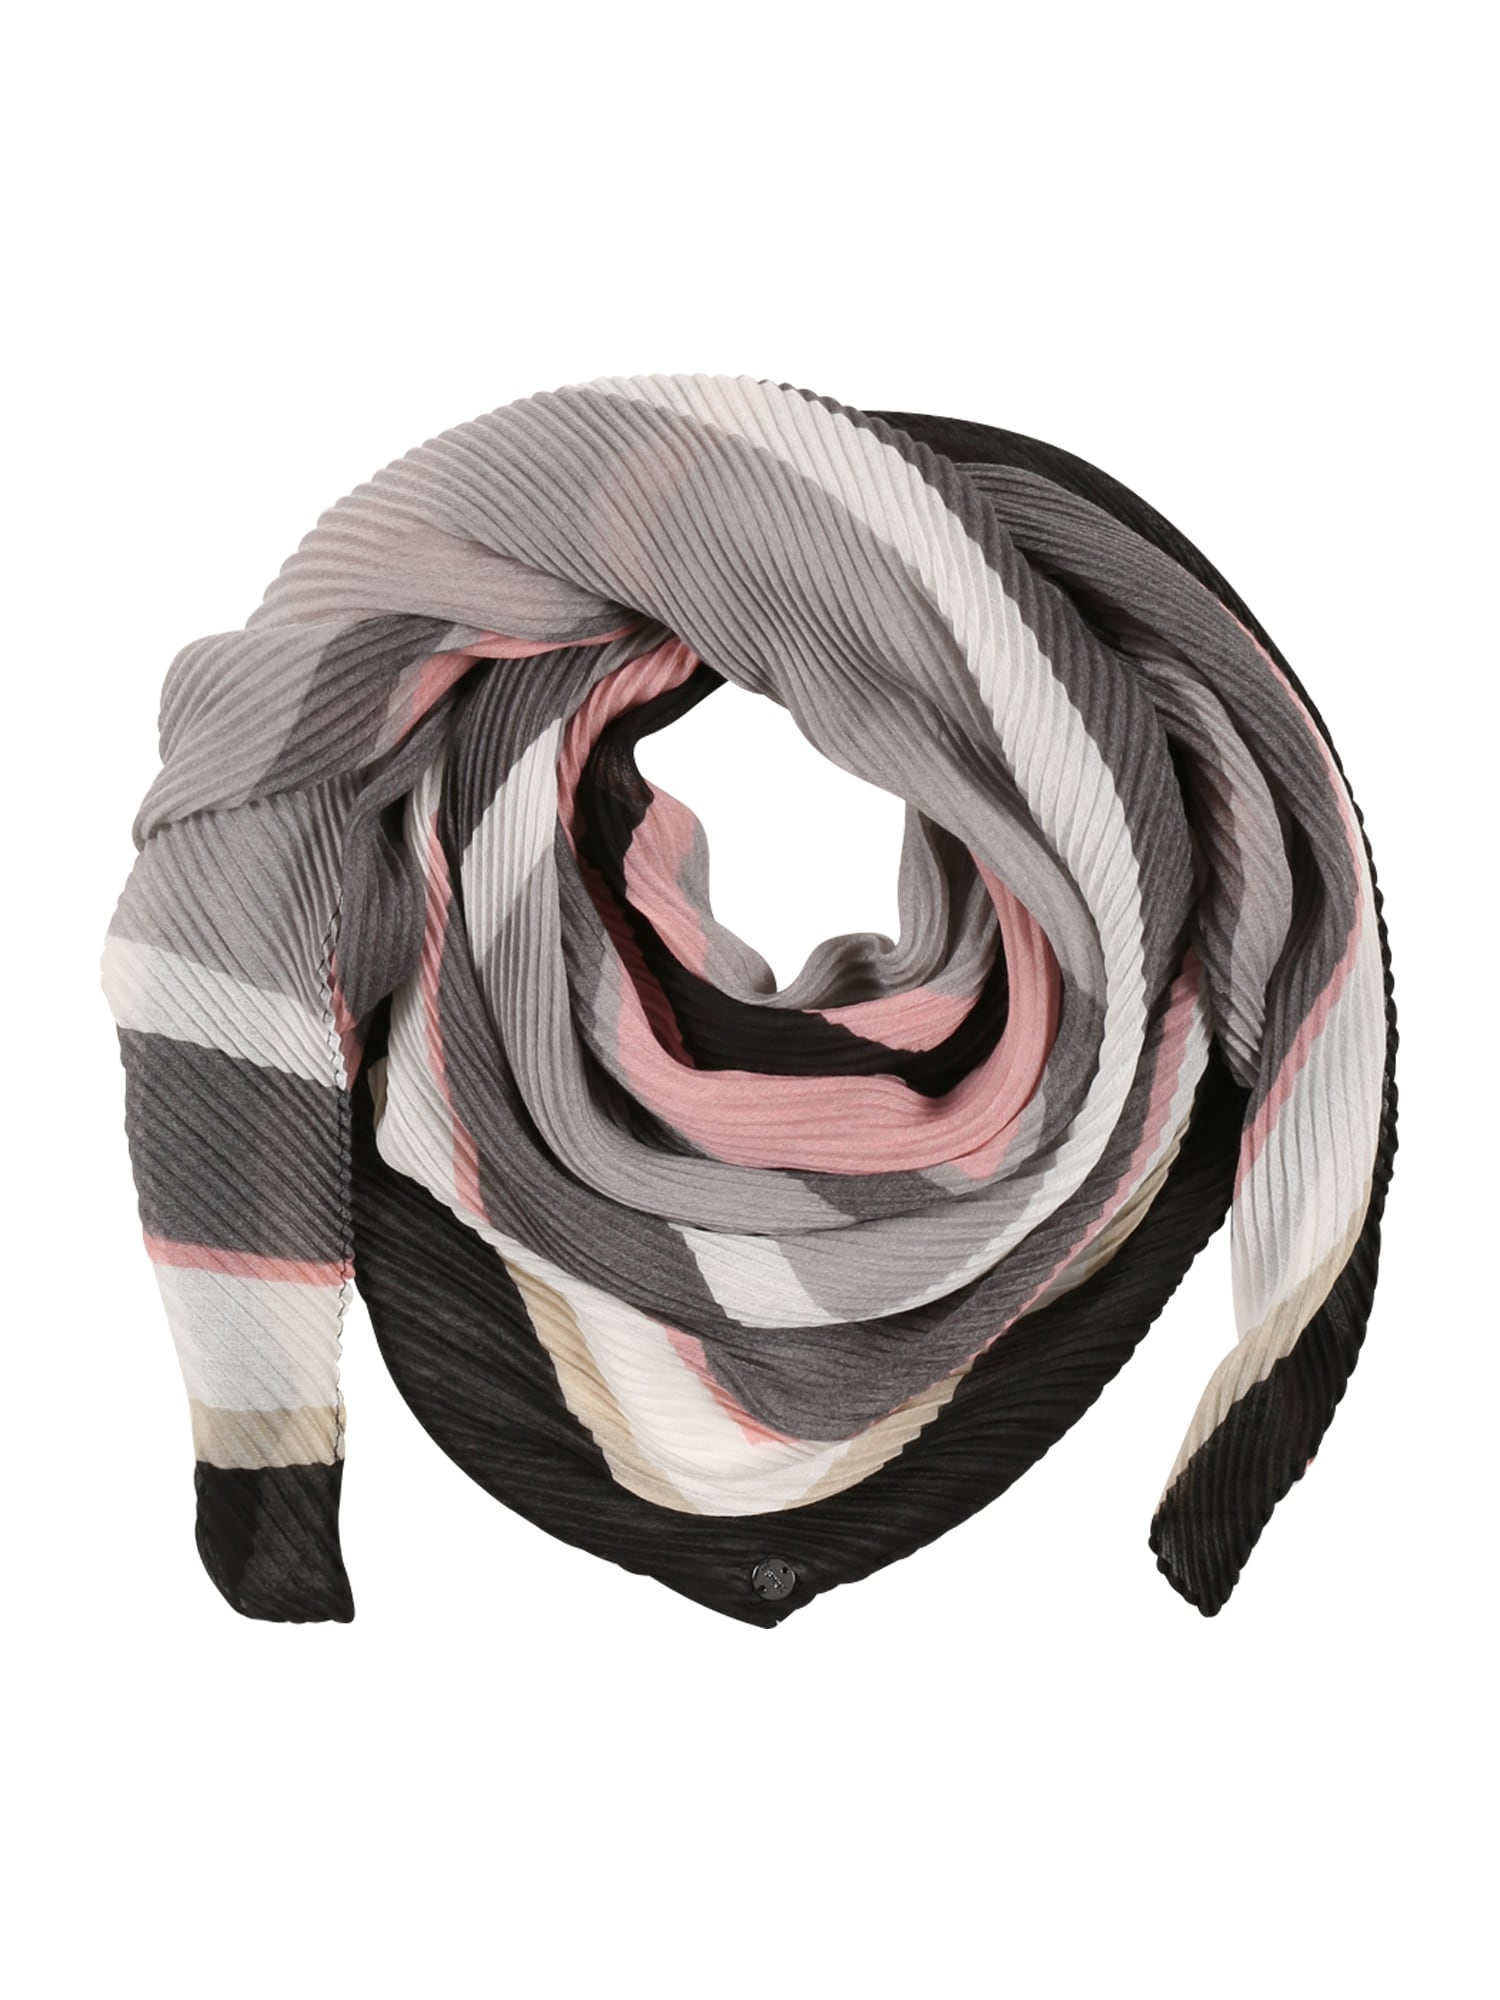 ESPRIT Skara pilka / balta / antracito / rožių spalva